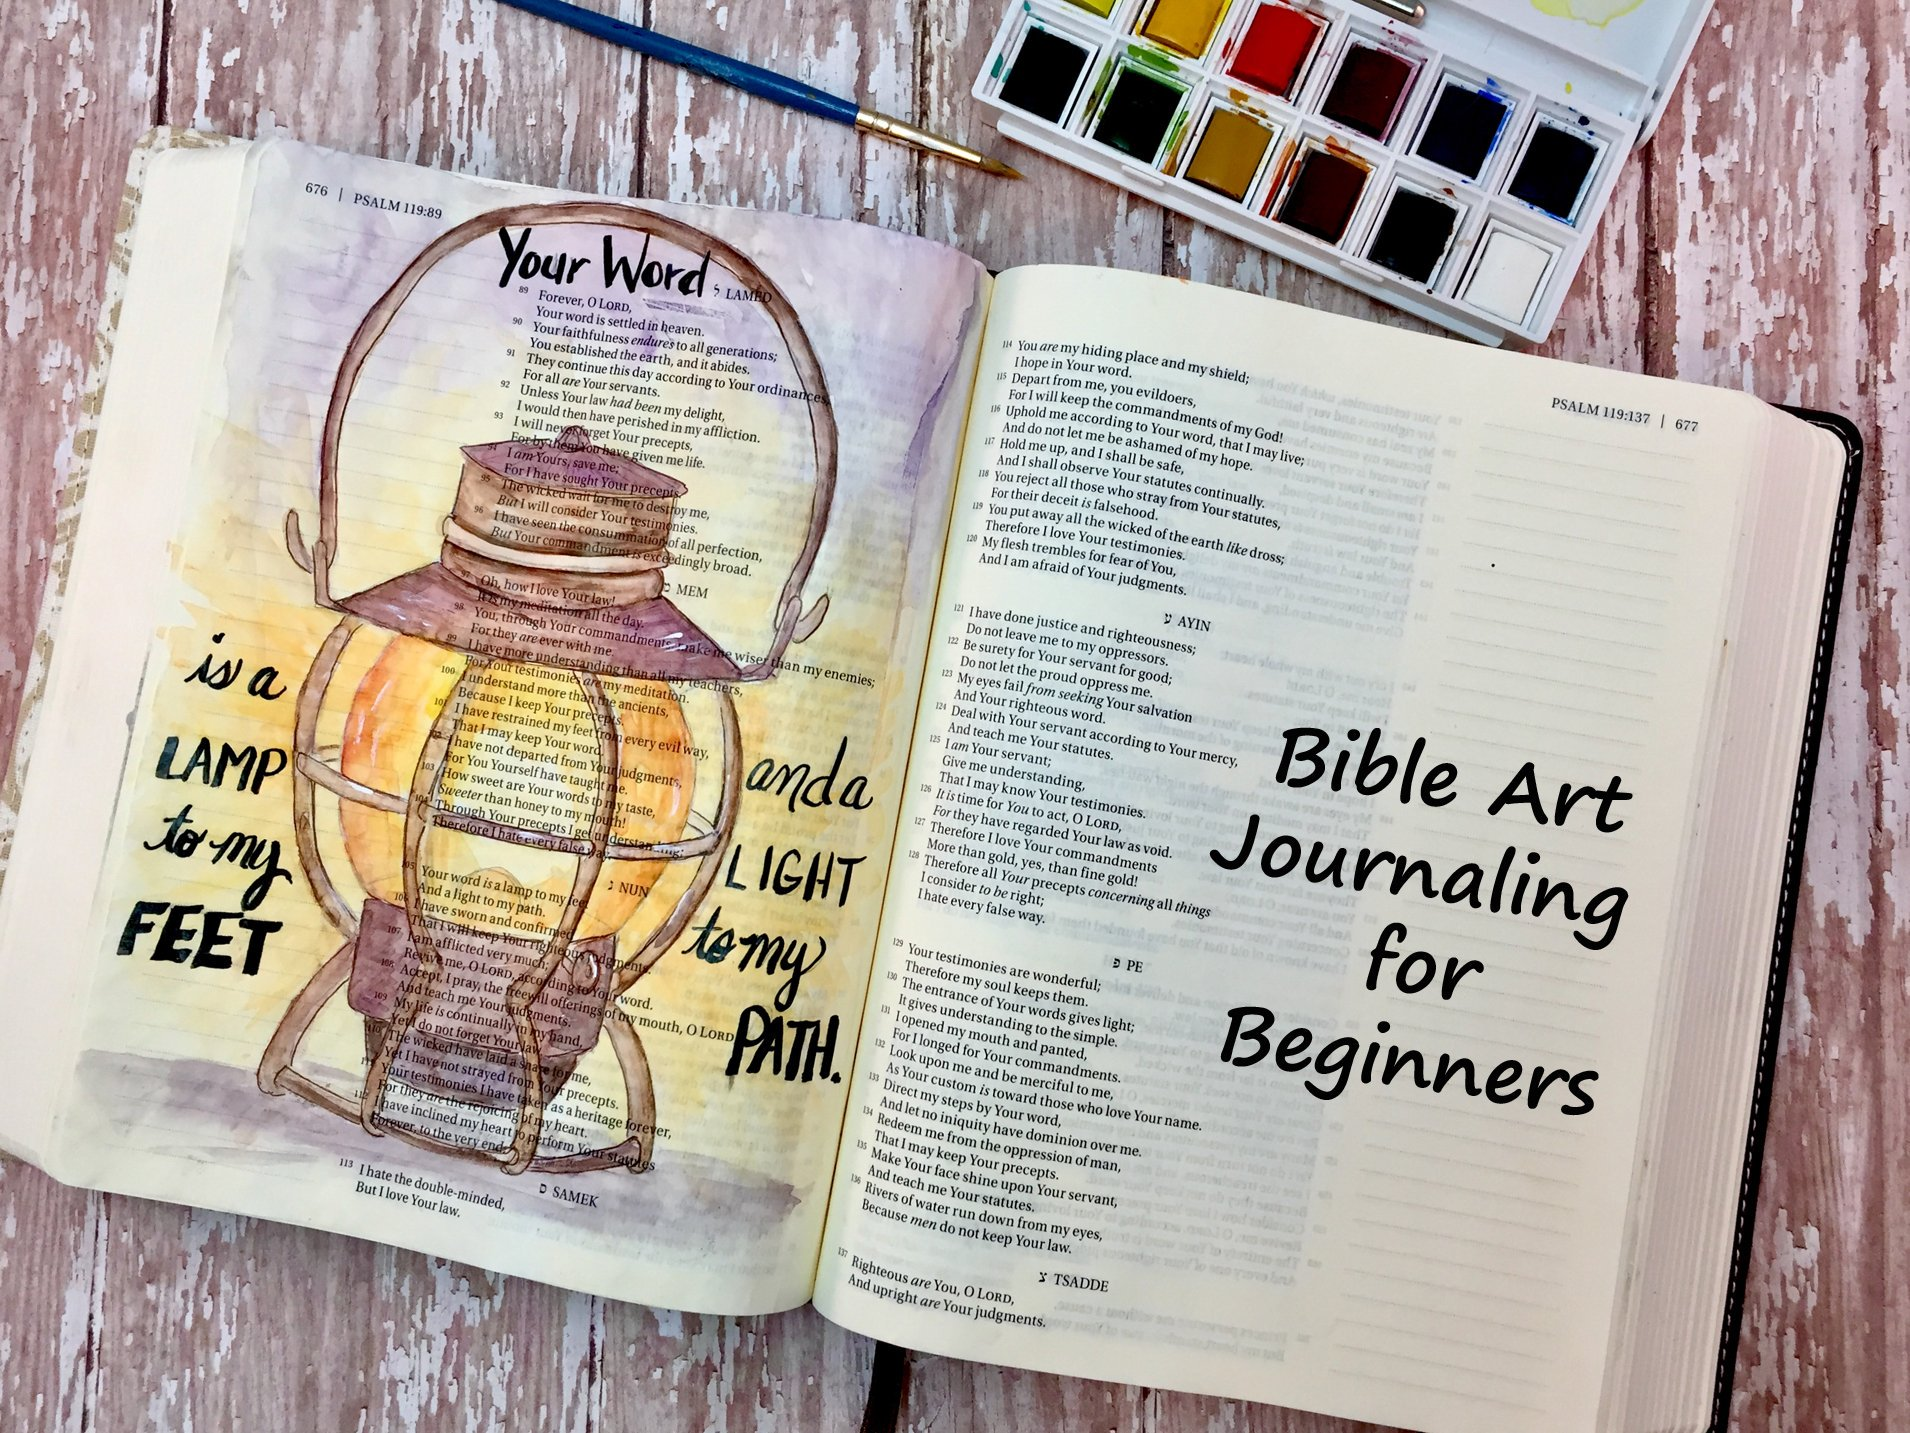 Bible_art_journaling